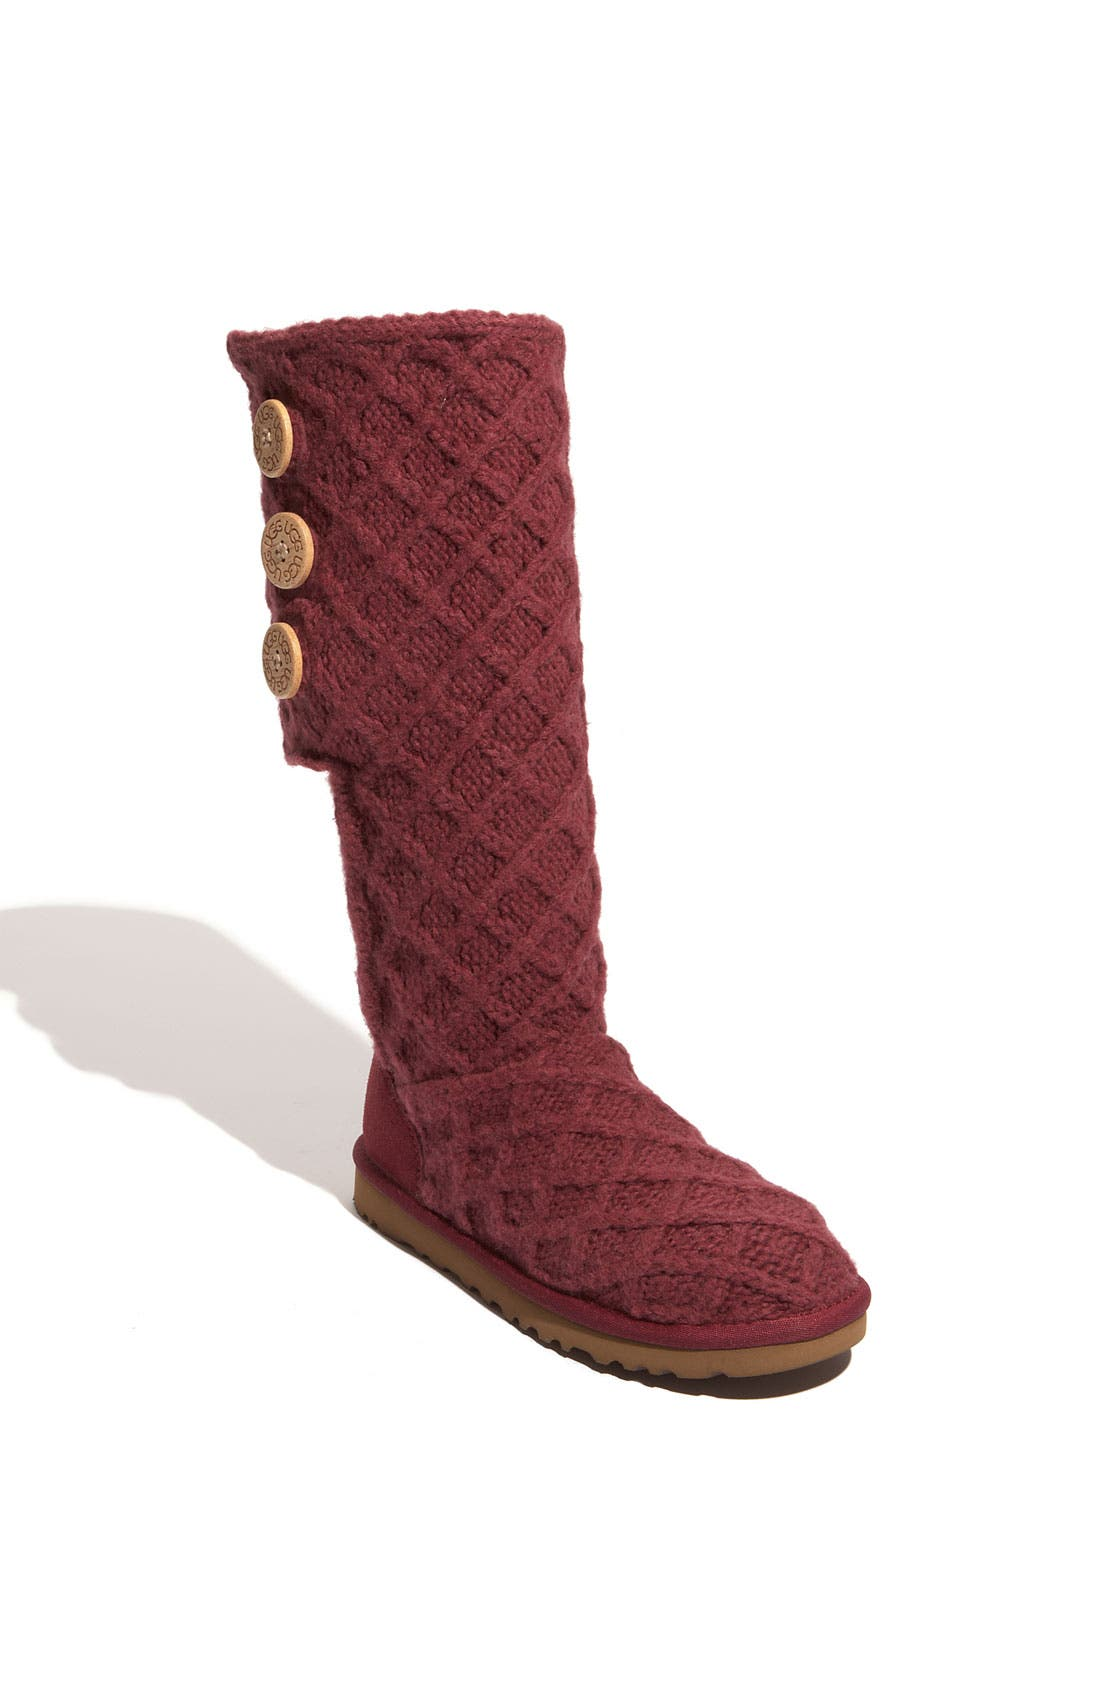 Alternate Image 1 Selected - UGG® Australia 'Lattice Cardy' Boot (Women)